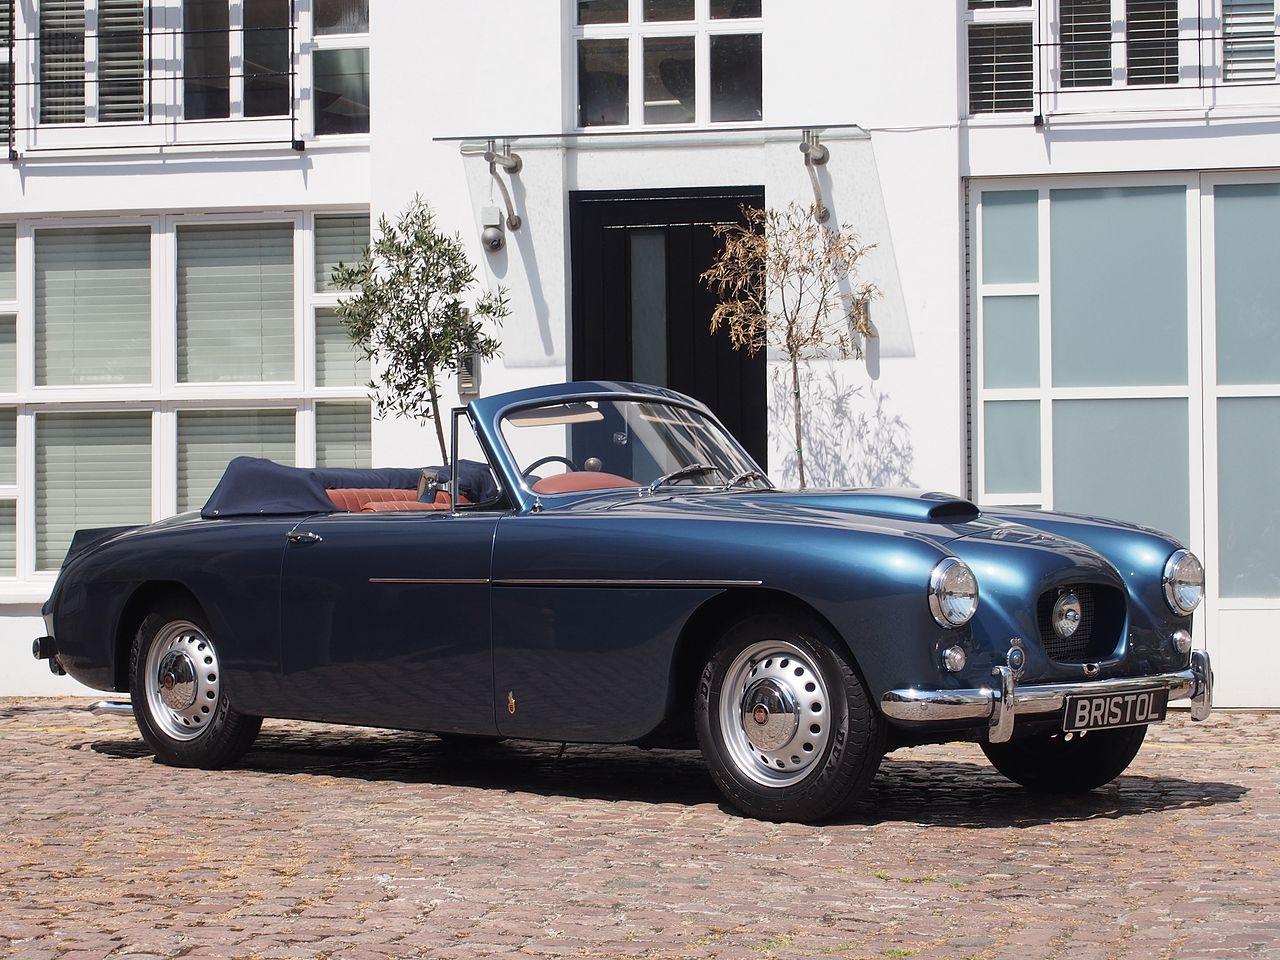 1956_Bristol_405_Drop_Head_Coupe